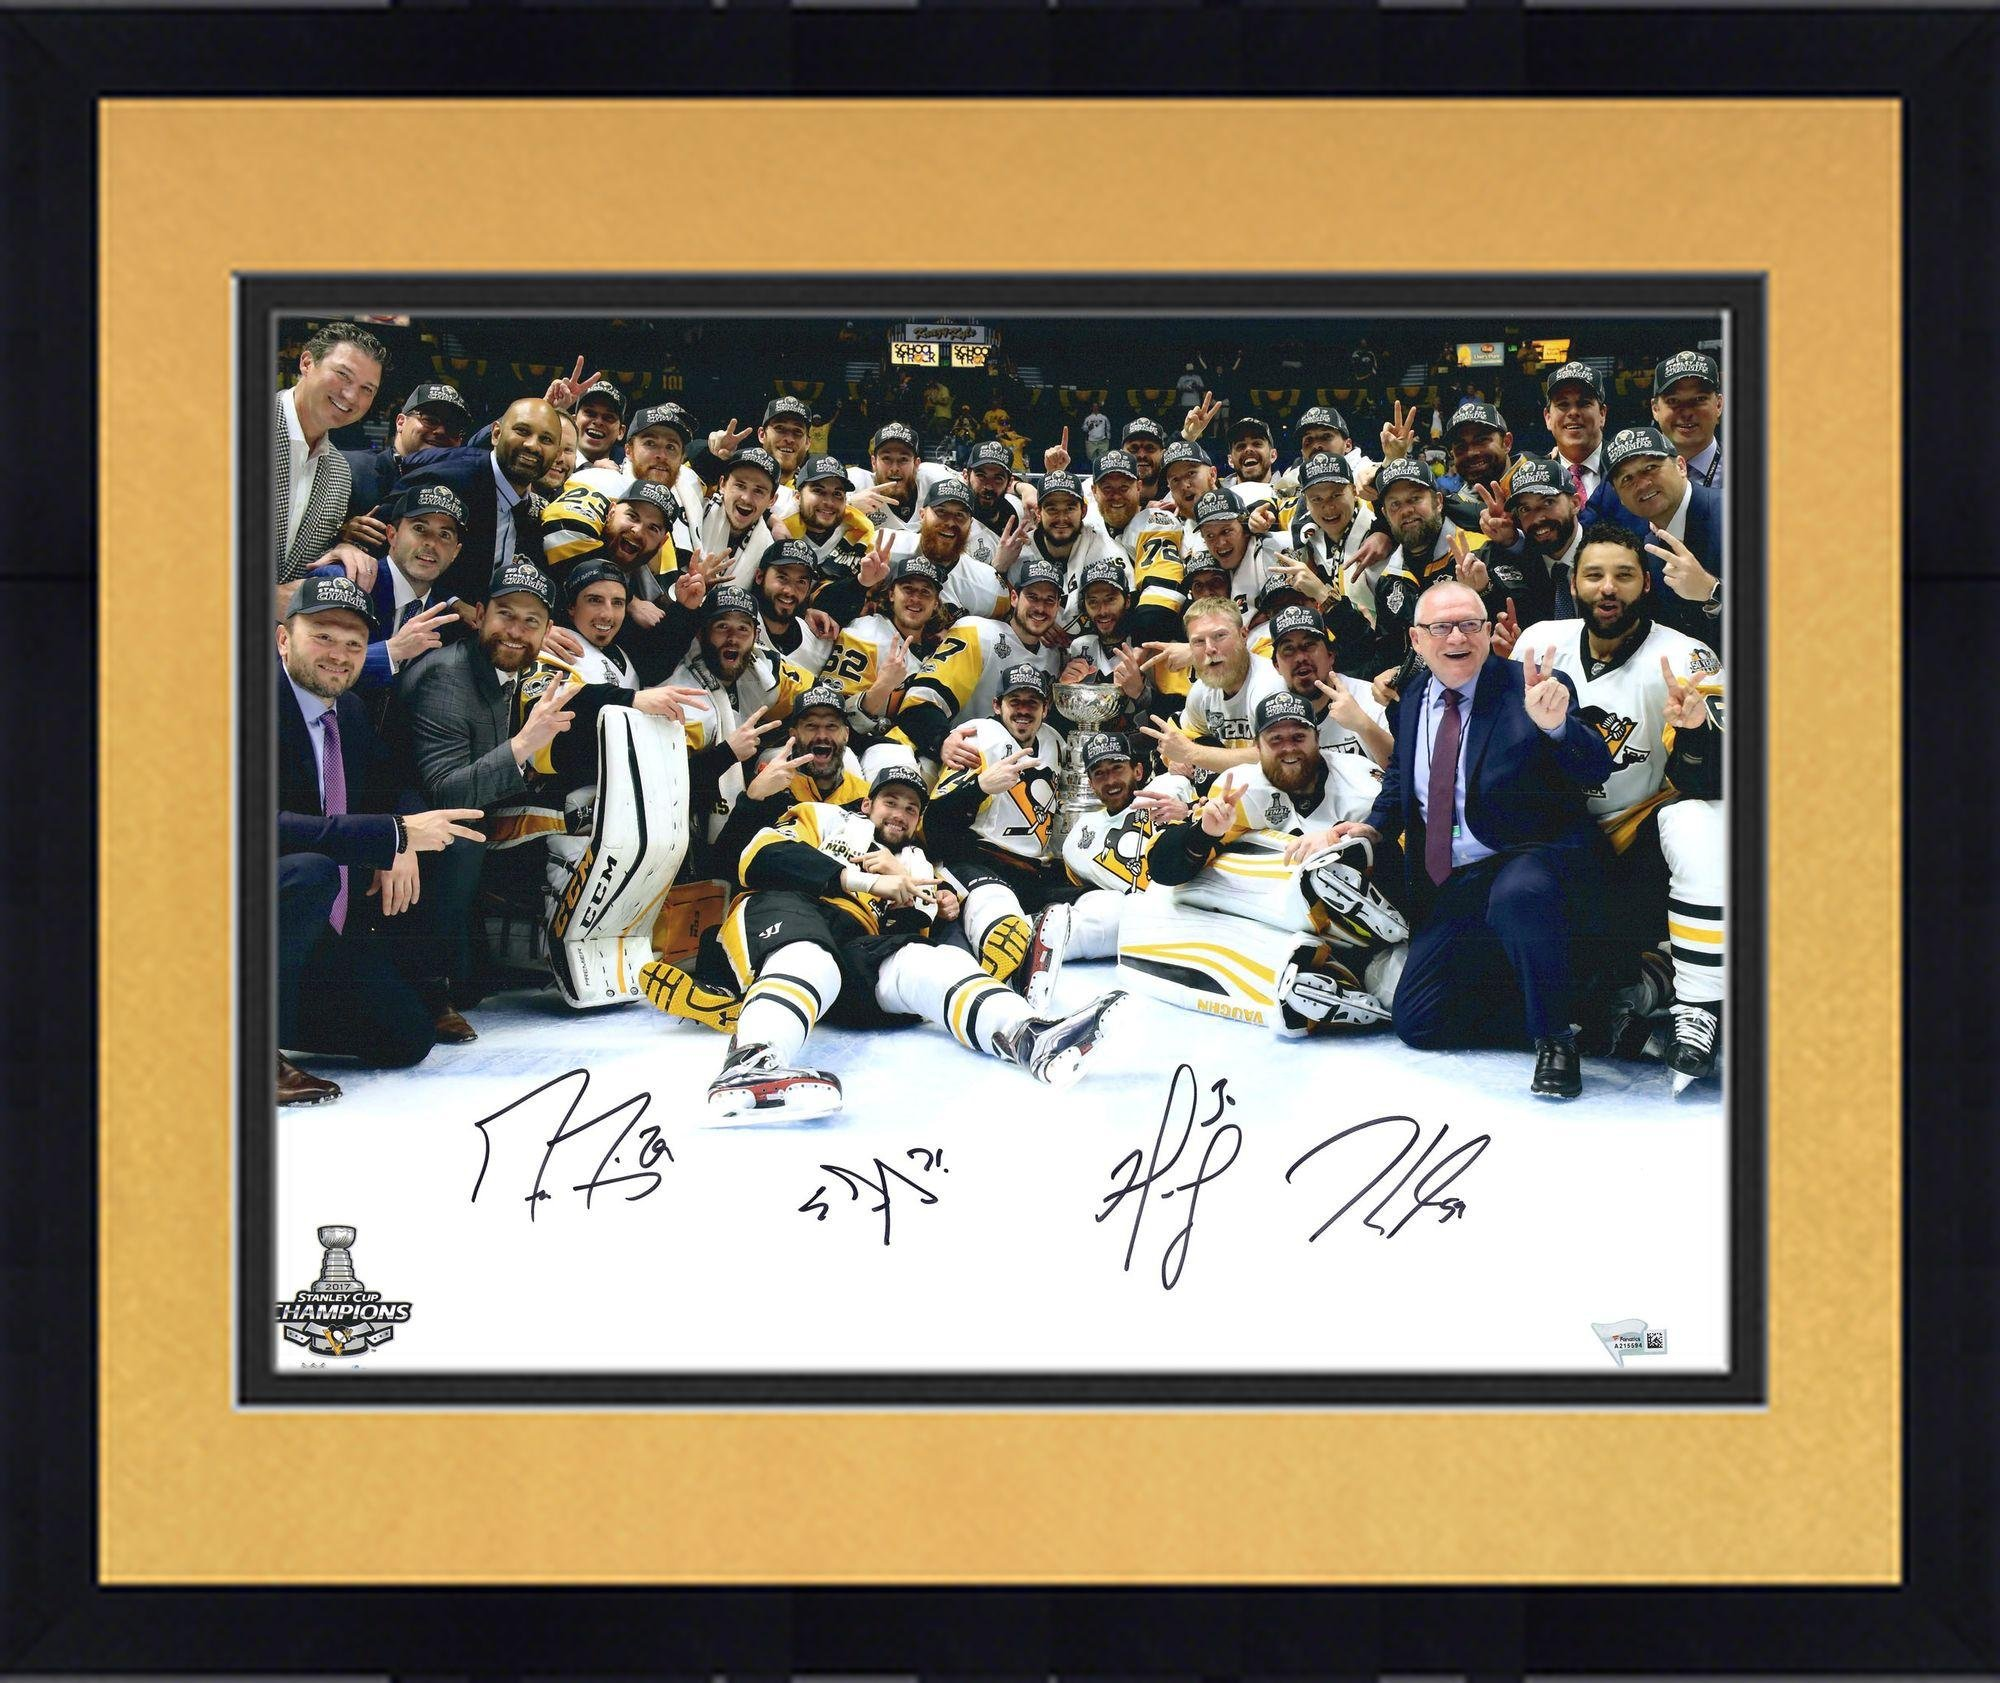 "Framed Marc Andre Fleury, Jake Guentzel, Evgeni Malkin & Matt Murray Pittsburgh Penguins 2017 Stanley Cup Champions Autographed 16"" x 20"" Team Celebration Photograph Fanatics Authentic Certified"